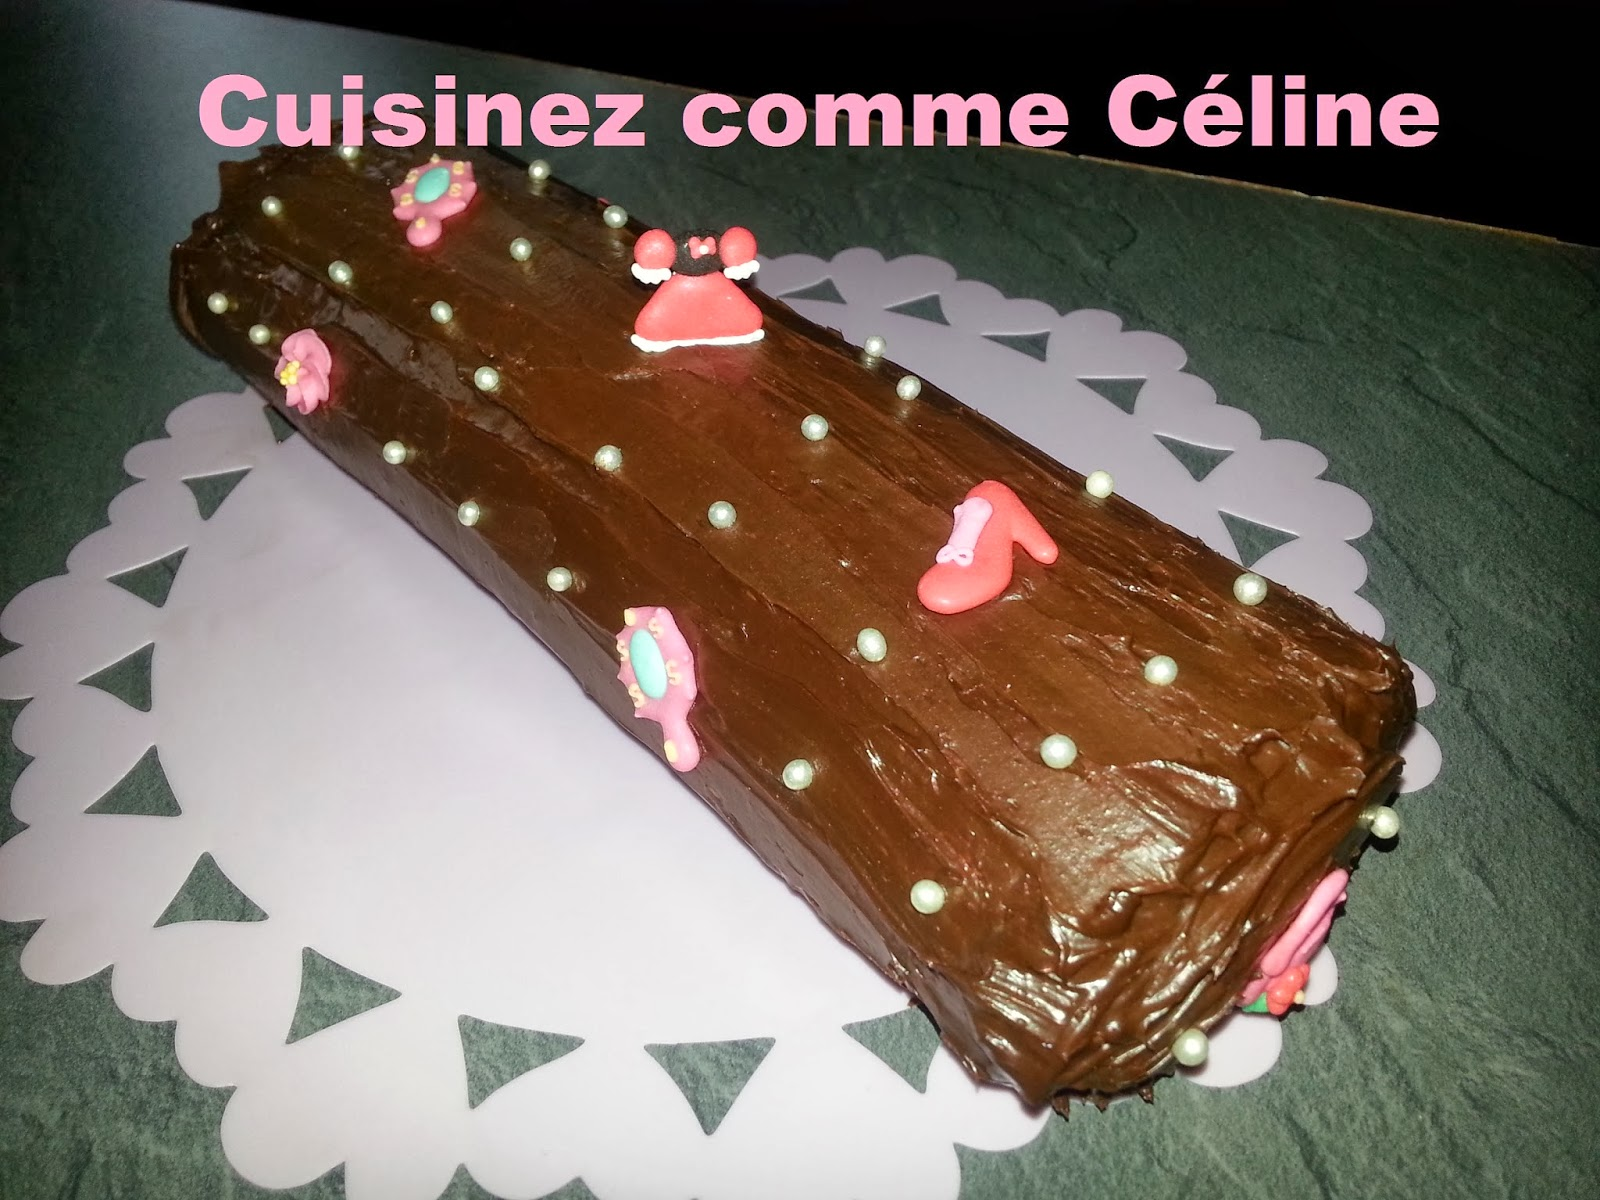 Cuisinezcommec lineetpoupette b che cr me p tissi re vanille p pite chocolat blanc ganache - Creme patissiere chocolat blanc ...